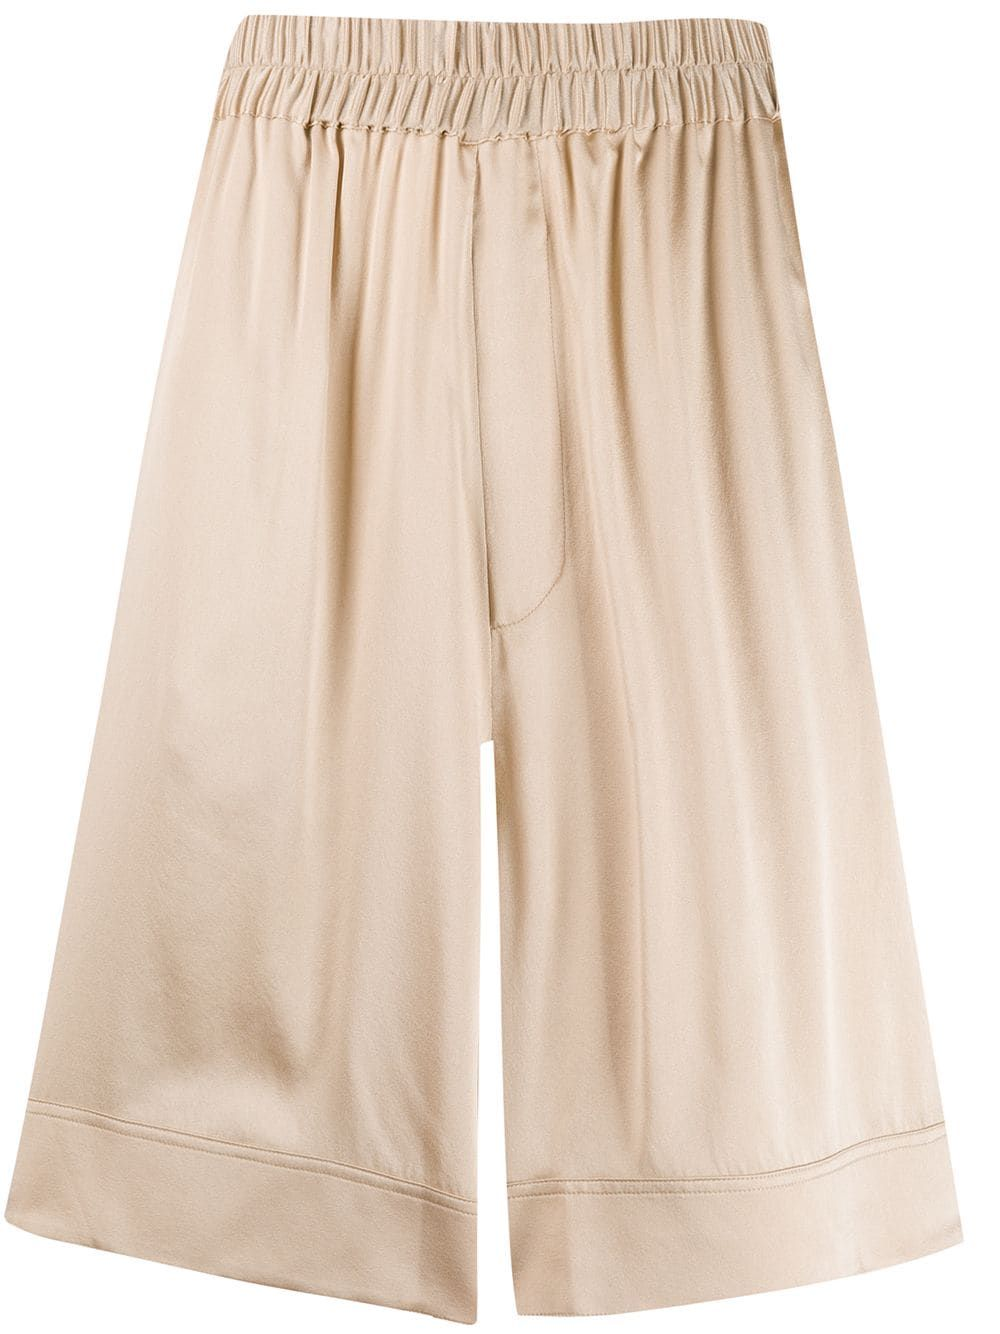 377f35dafe7 LANEUS LANEUS BASKETBALL STYLE SHORTS - NUDE. #laneus #cloth ...